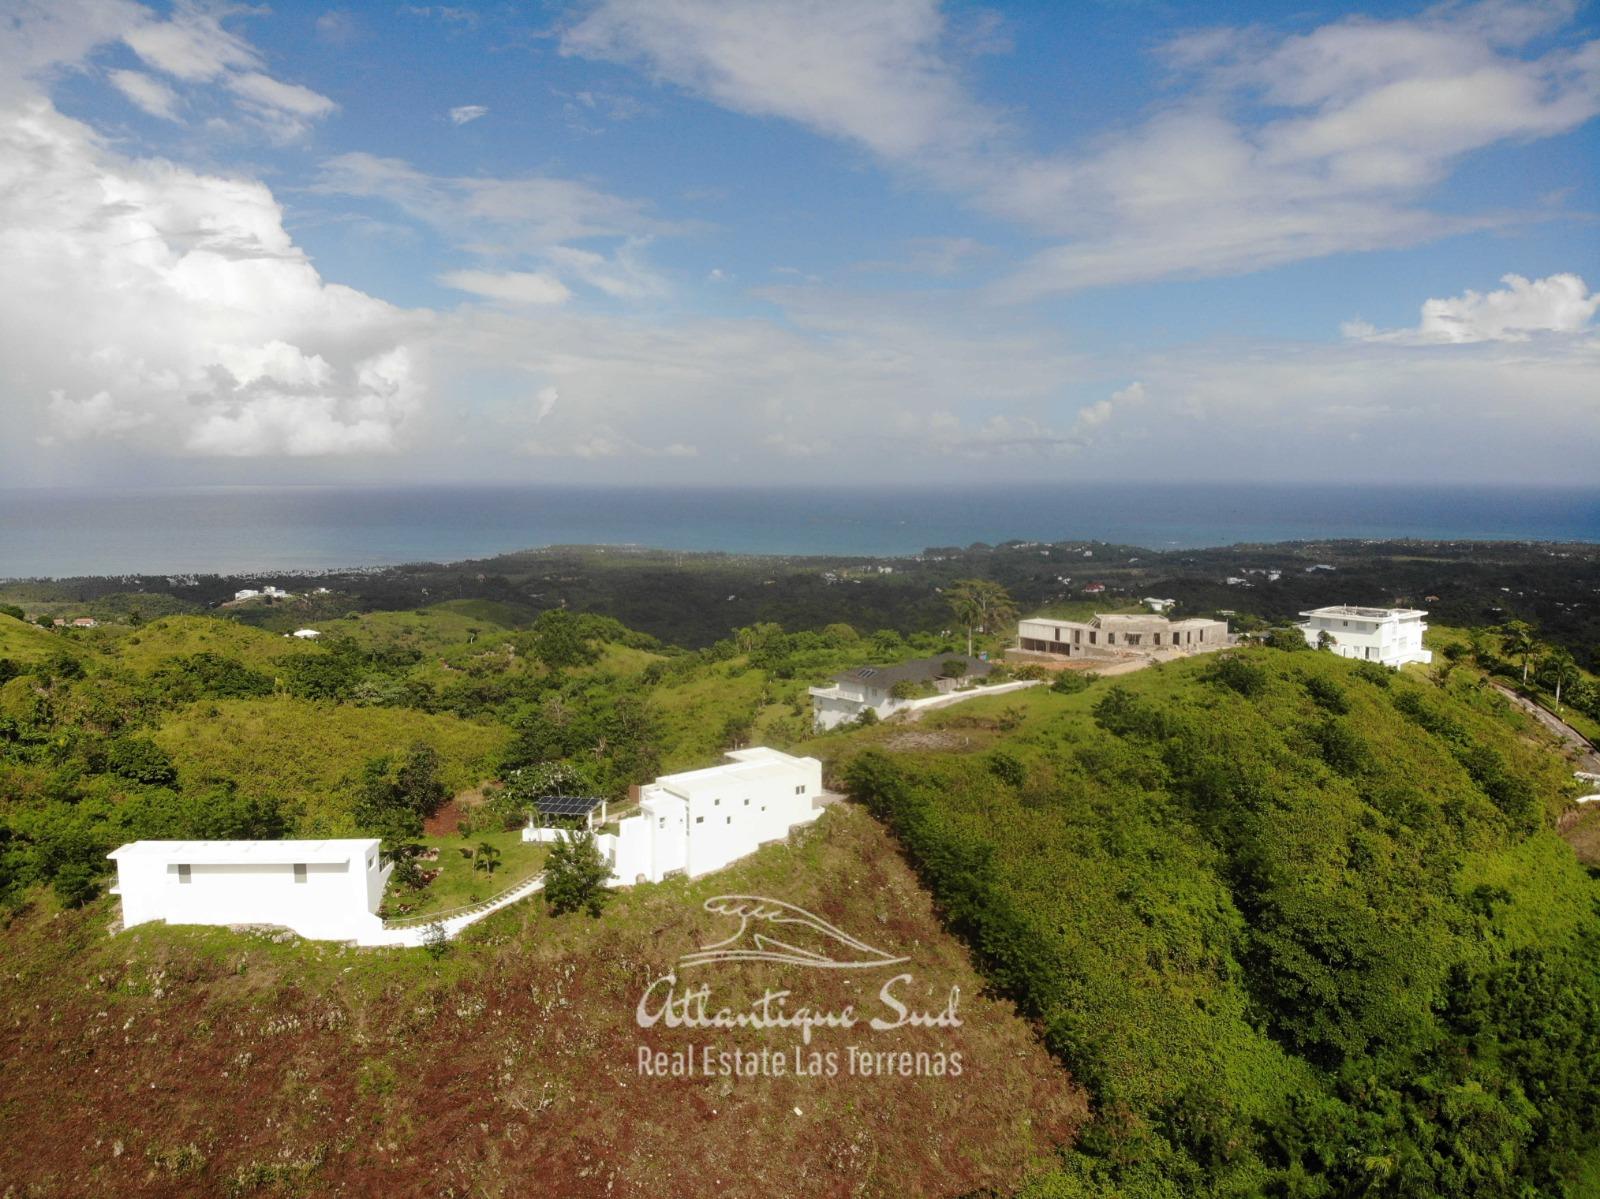 Hillside Lots for sale in Las Terrenas13.jpeg